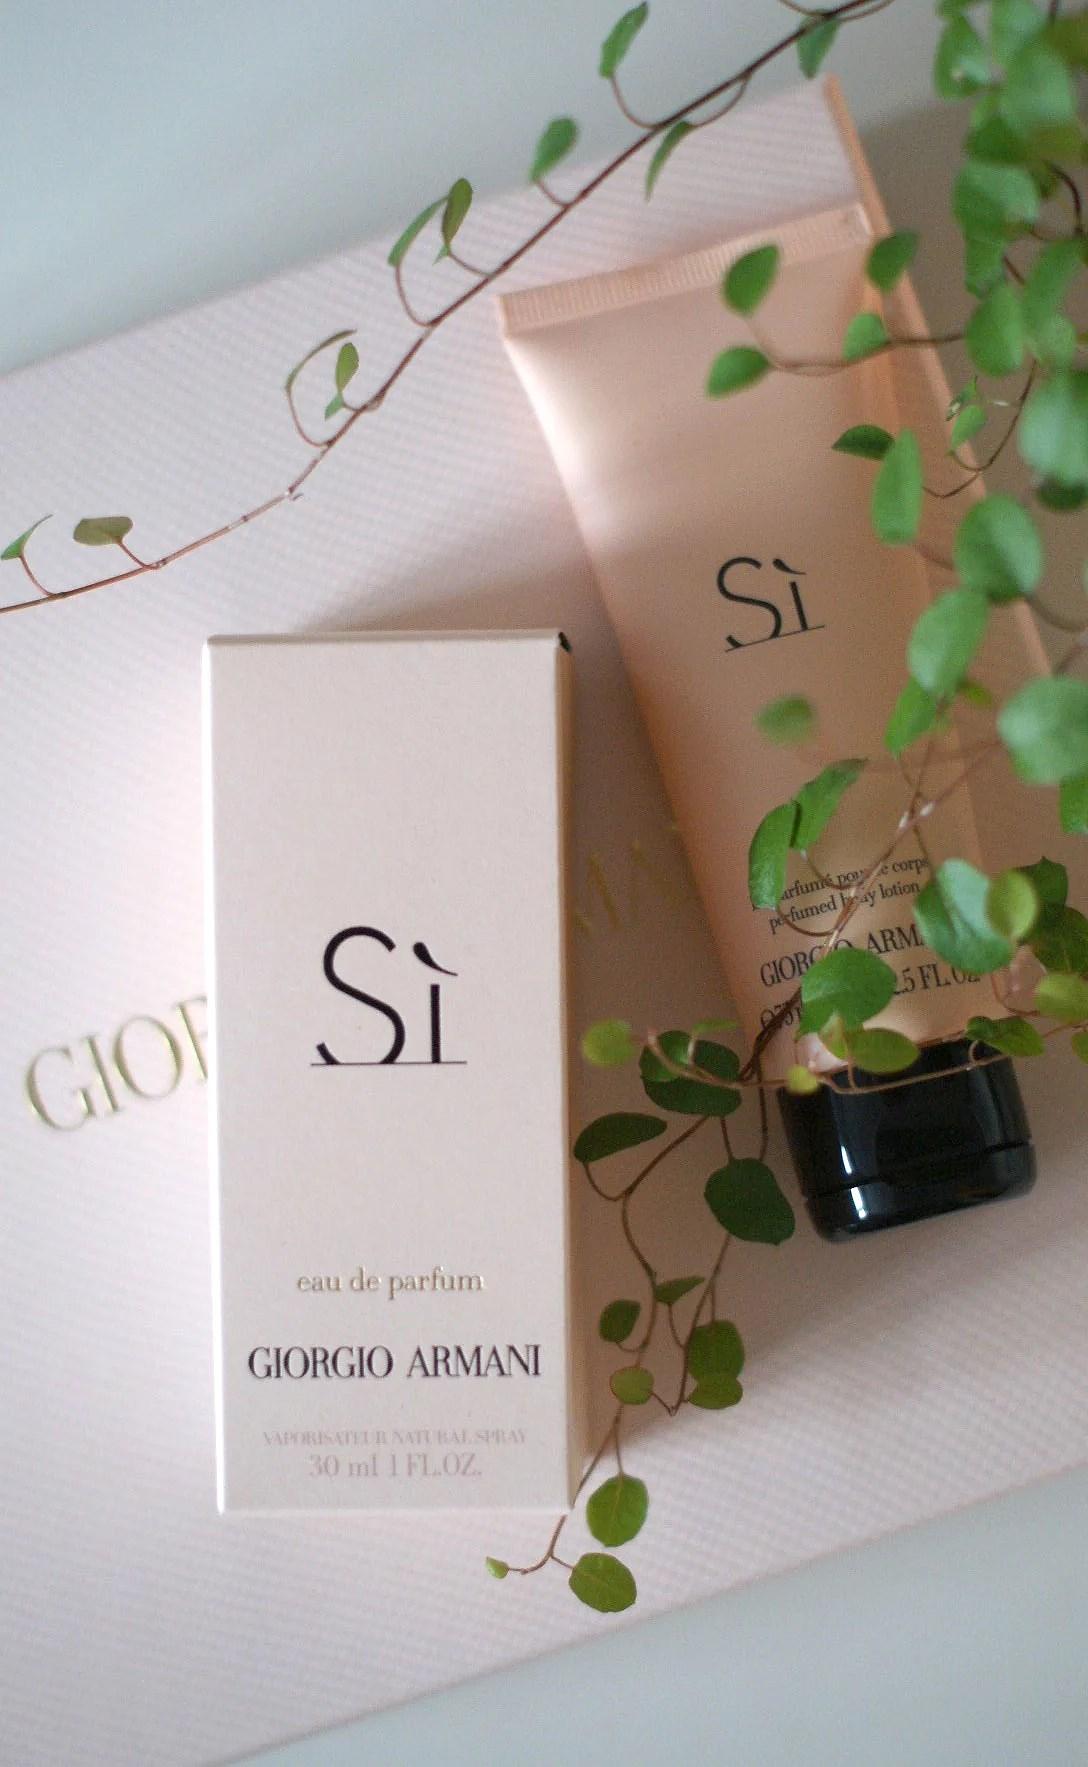 Giorgio armani-si parfume-si-It's My Passions-Modeblog-Dansk modeblogger-Aalborg modeblog-Julie Mænnchen